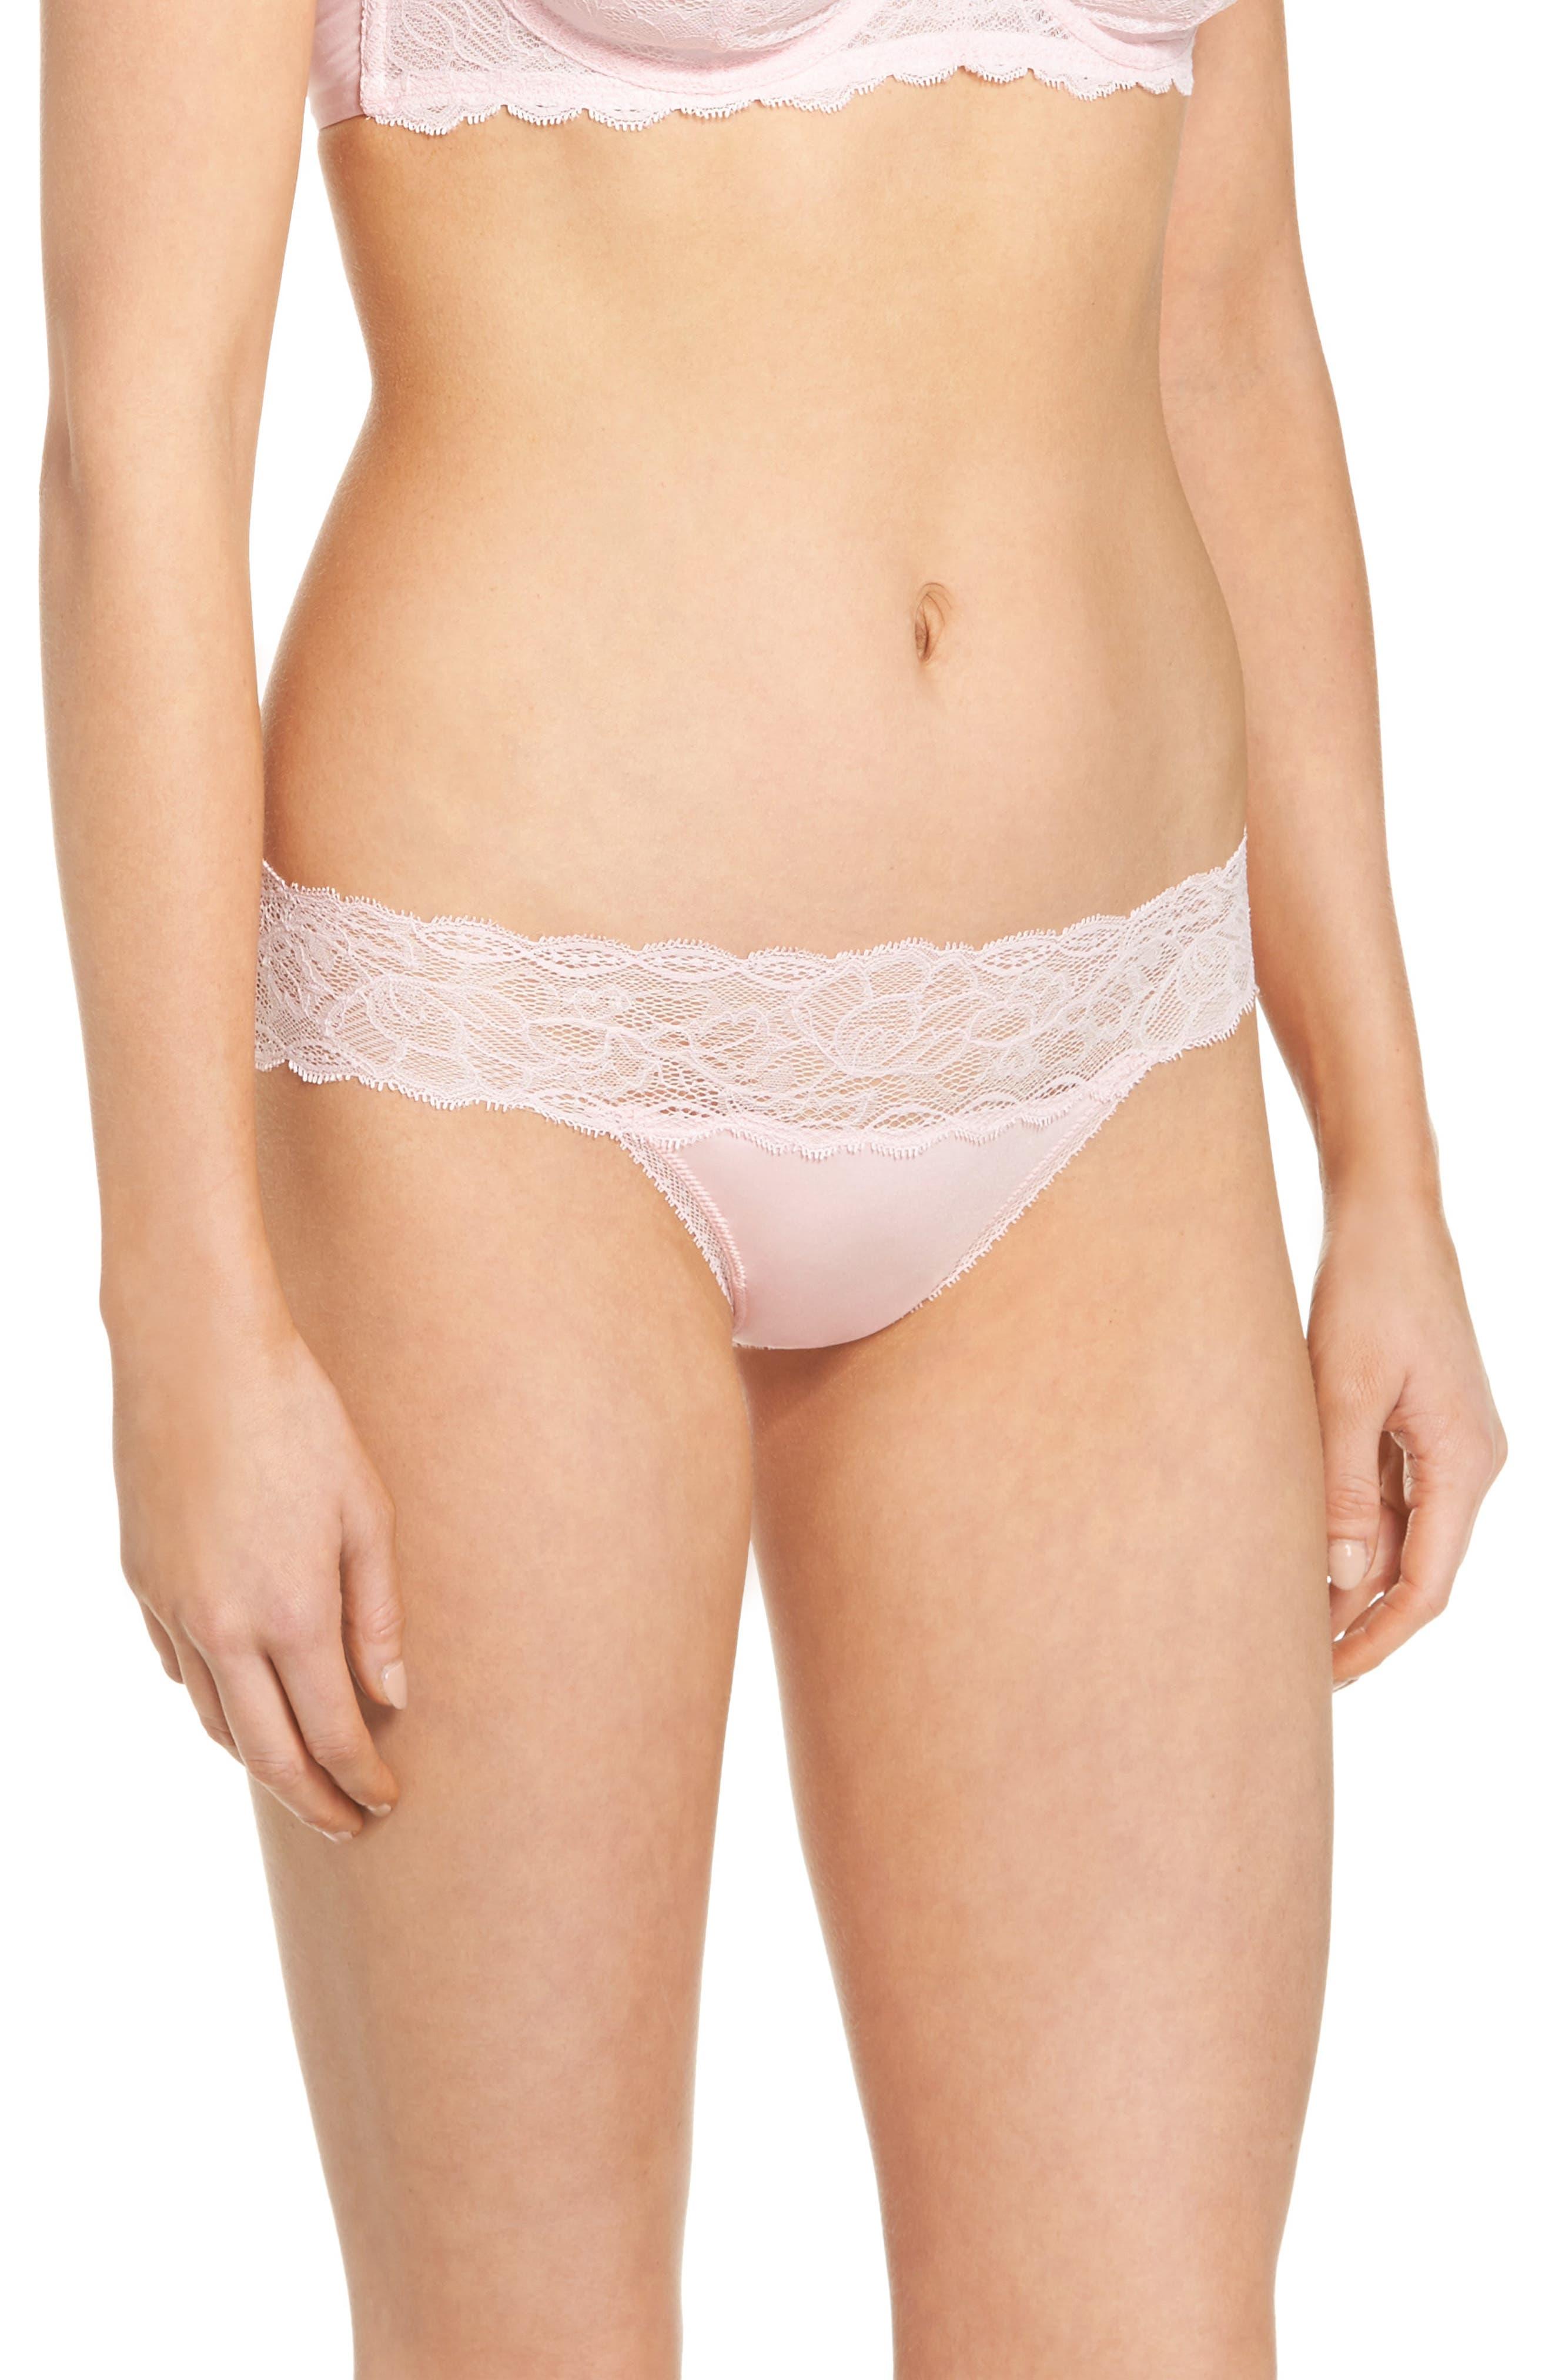 Seductive Comfort Lace Bikini,                             Alternate thumbnail 3, color,                             Attract